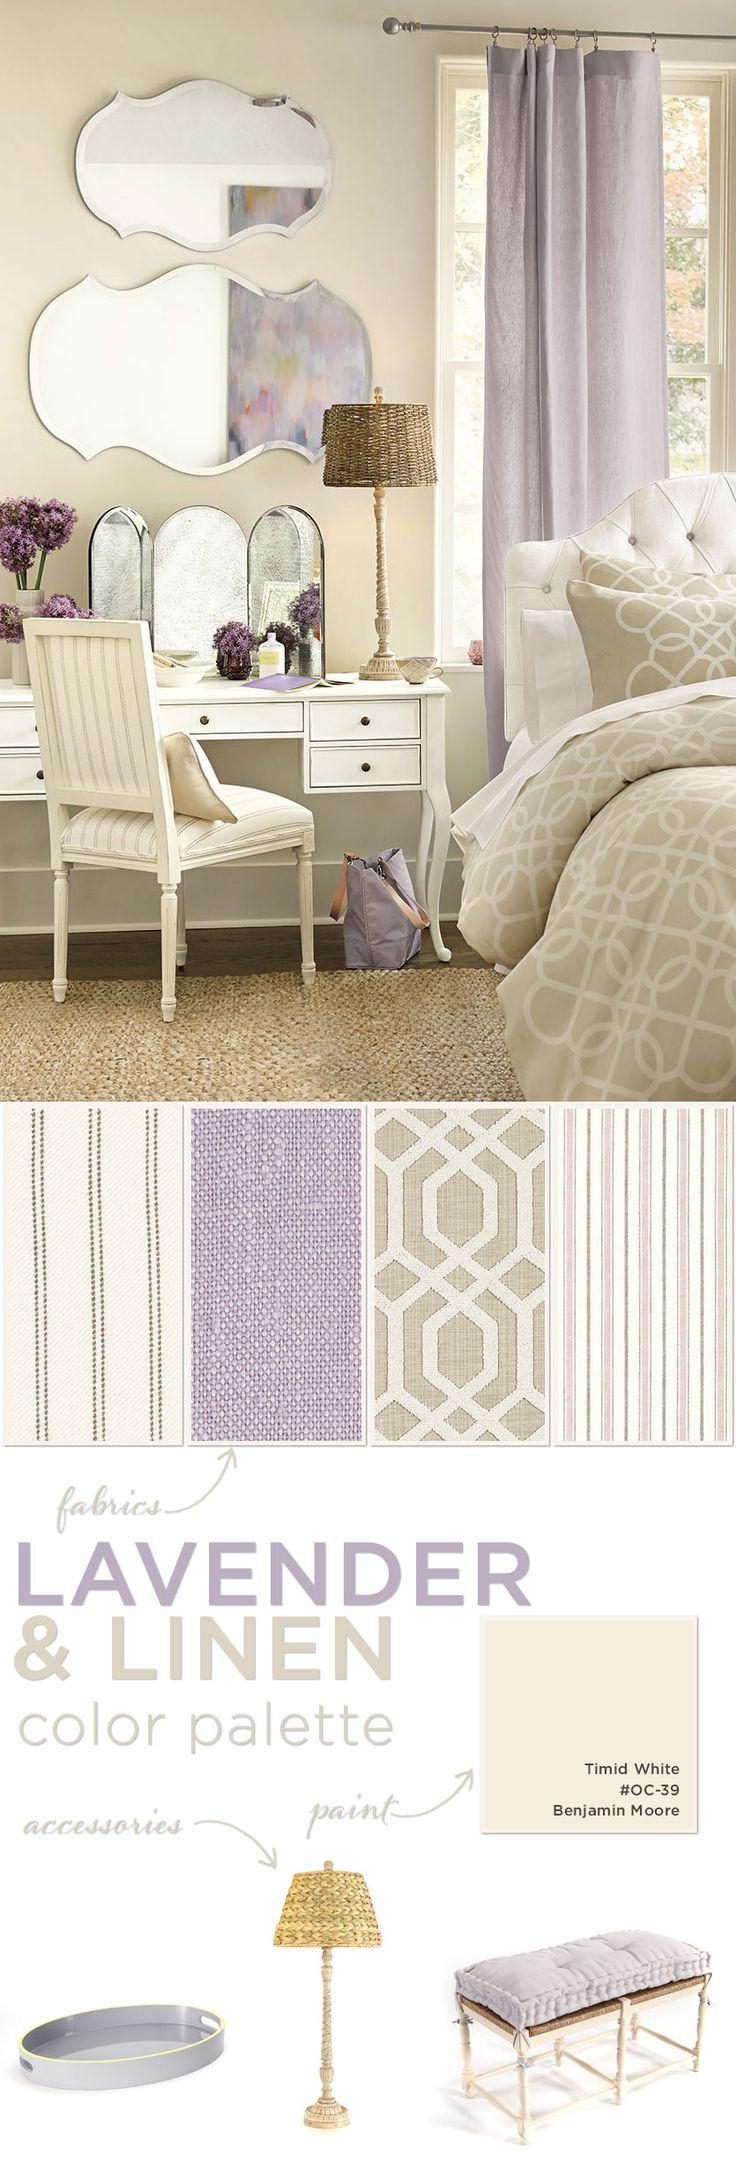 best 25 lavender bedrooms ideas only on pinterest